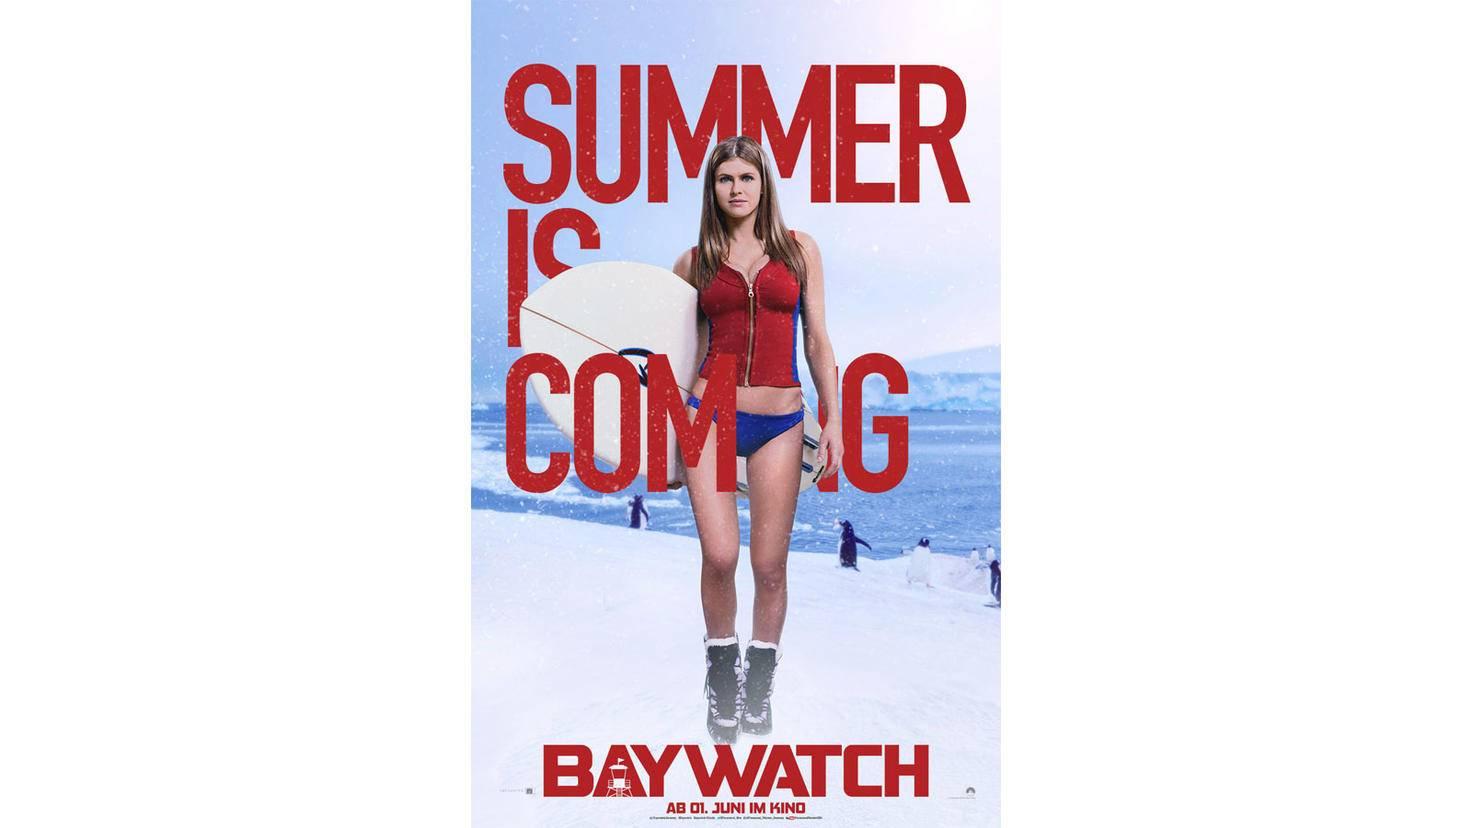 Summer Quinn (Alexandra Daddario)